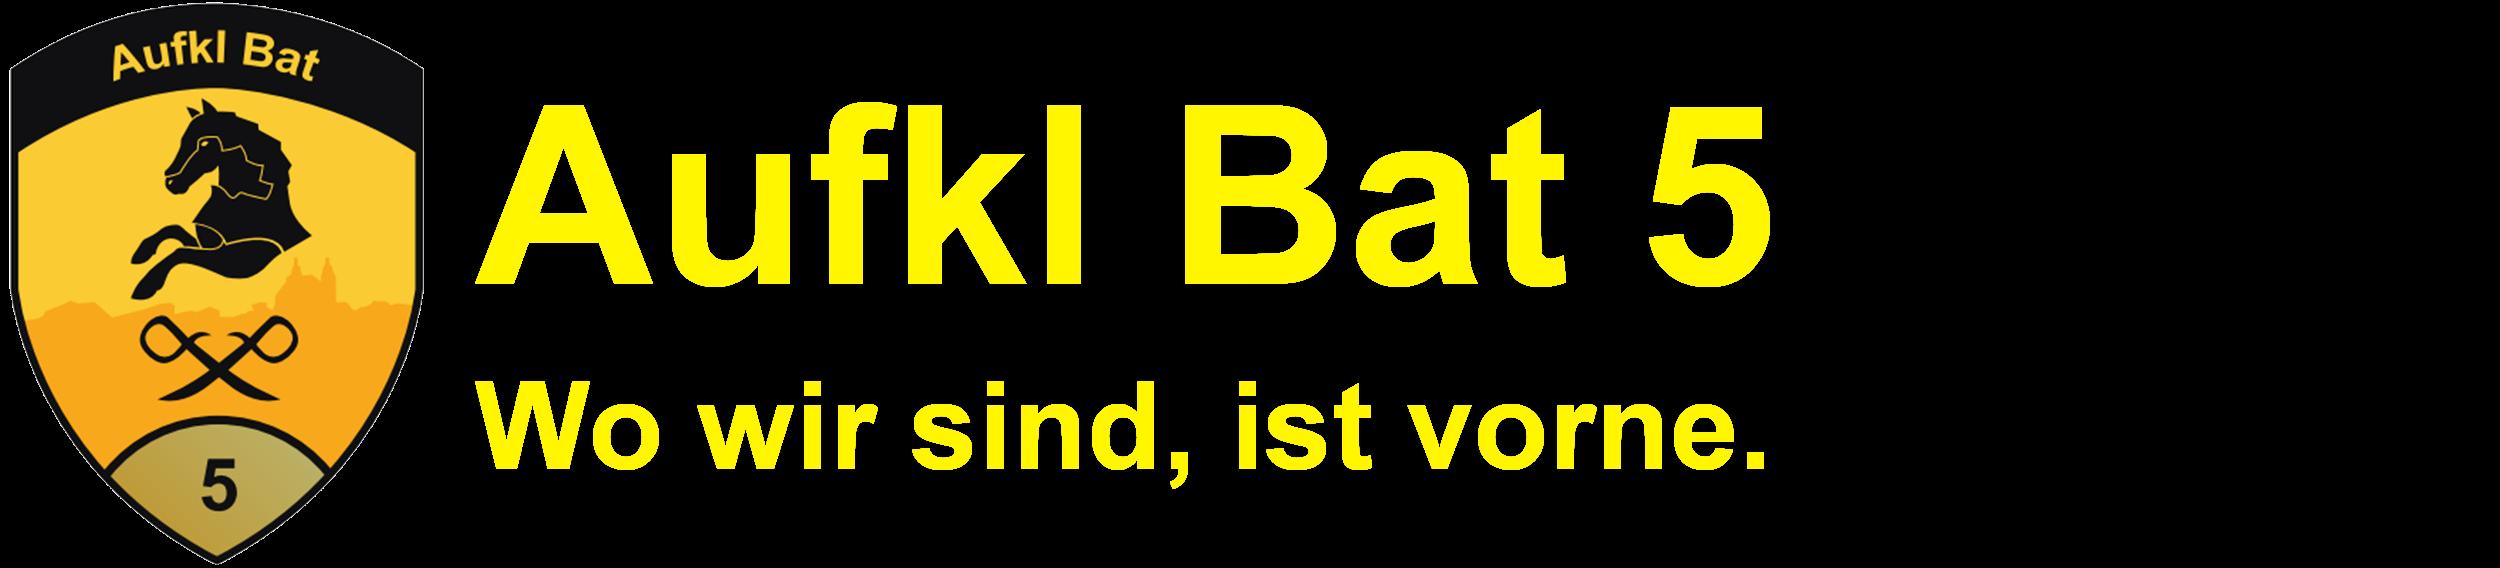 Aufkl Bat 5